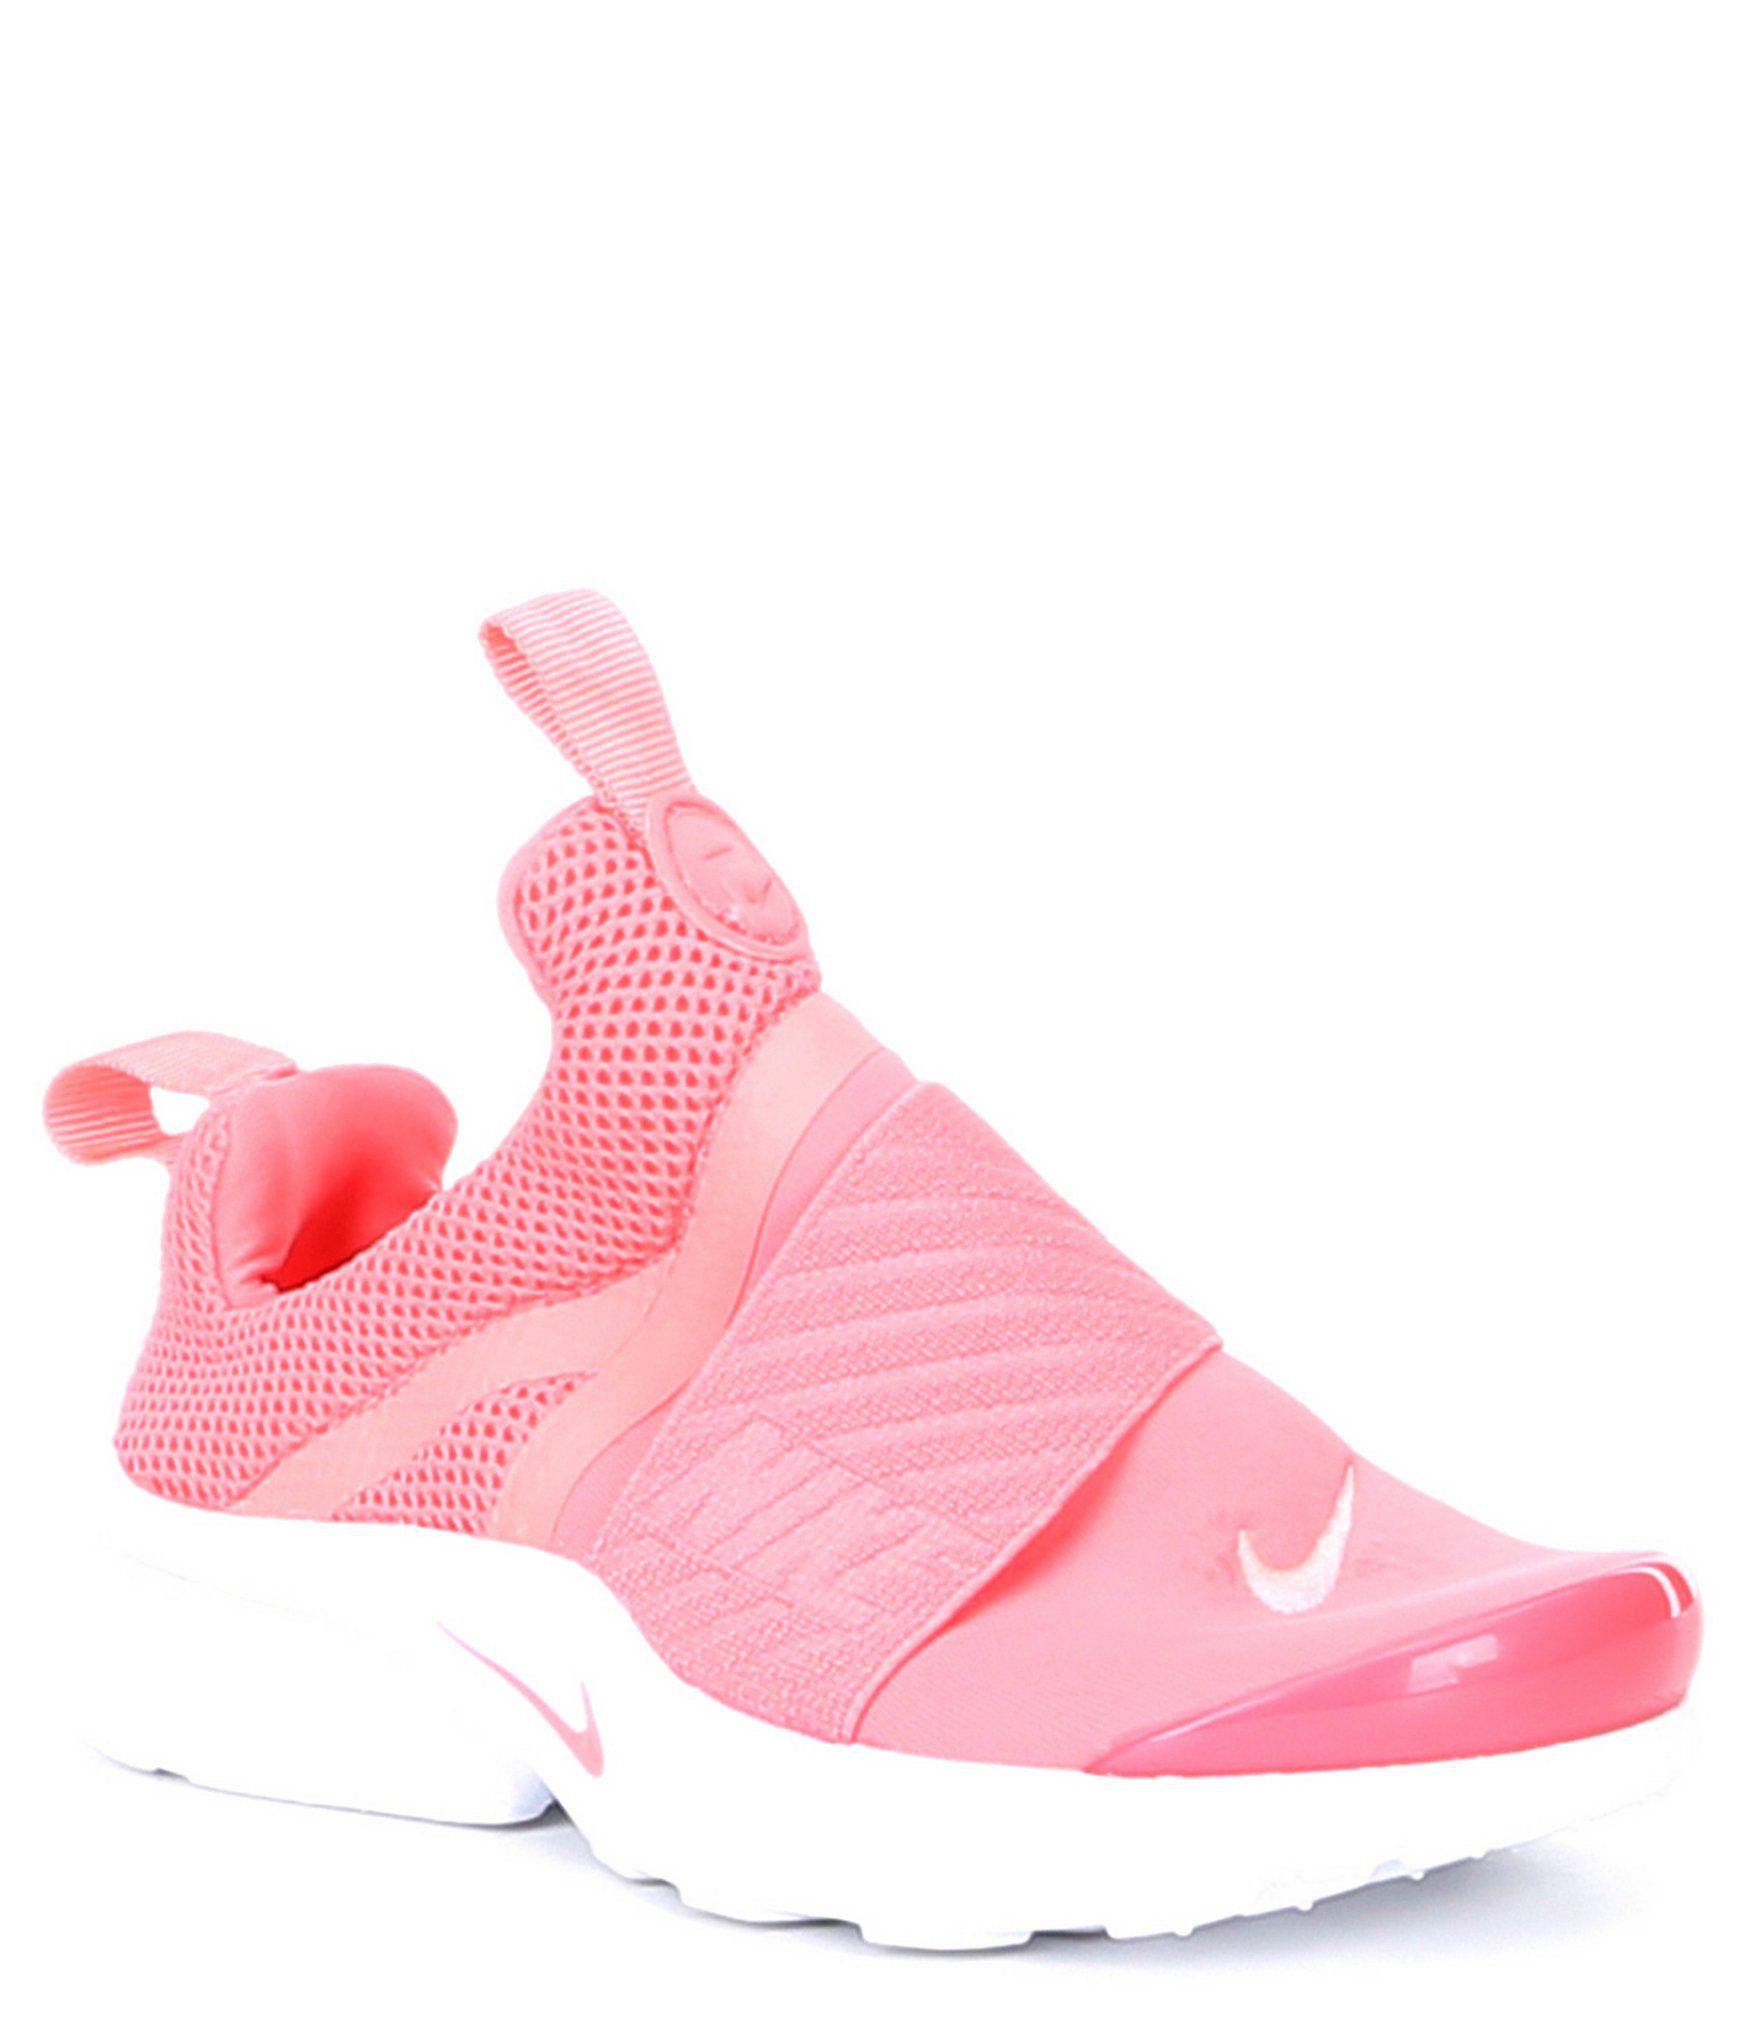 Nike Girls' Presto Extreme TD Slip On Sneakers Pink Gaze